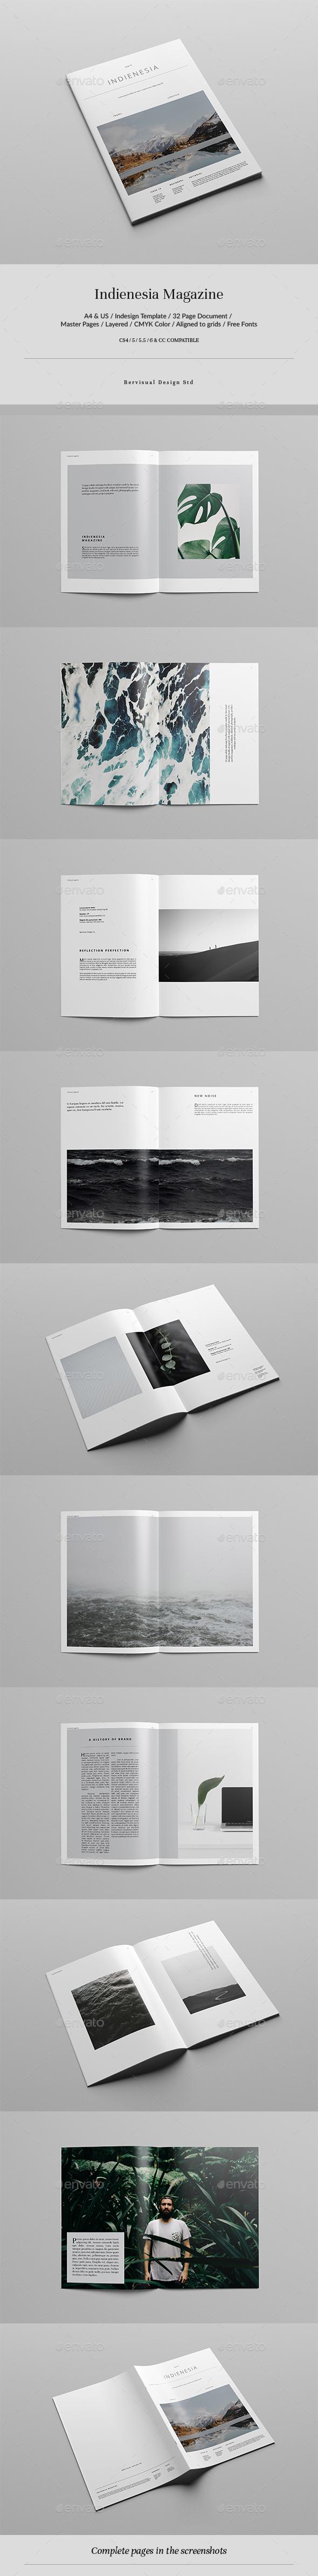 Indienesia Magazine - Magazines Print Templates